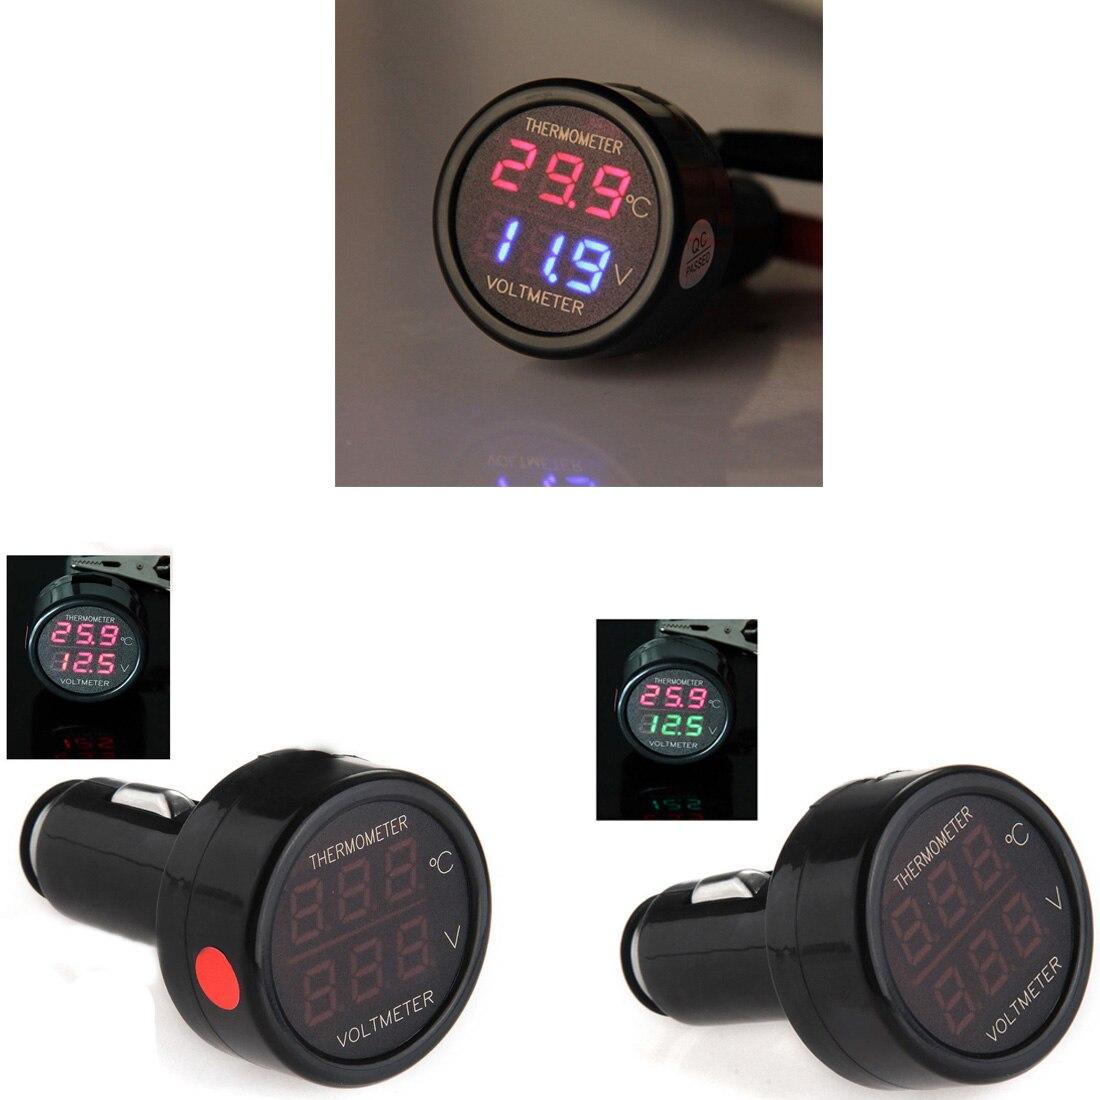 Digital Voltmeter Thermometer 2 In 1 LED Car Cigarette Lighter Applies To 12/24V Universal Car SUV Truck Voltage Meter